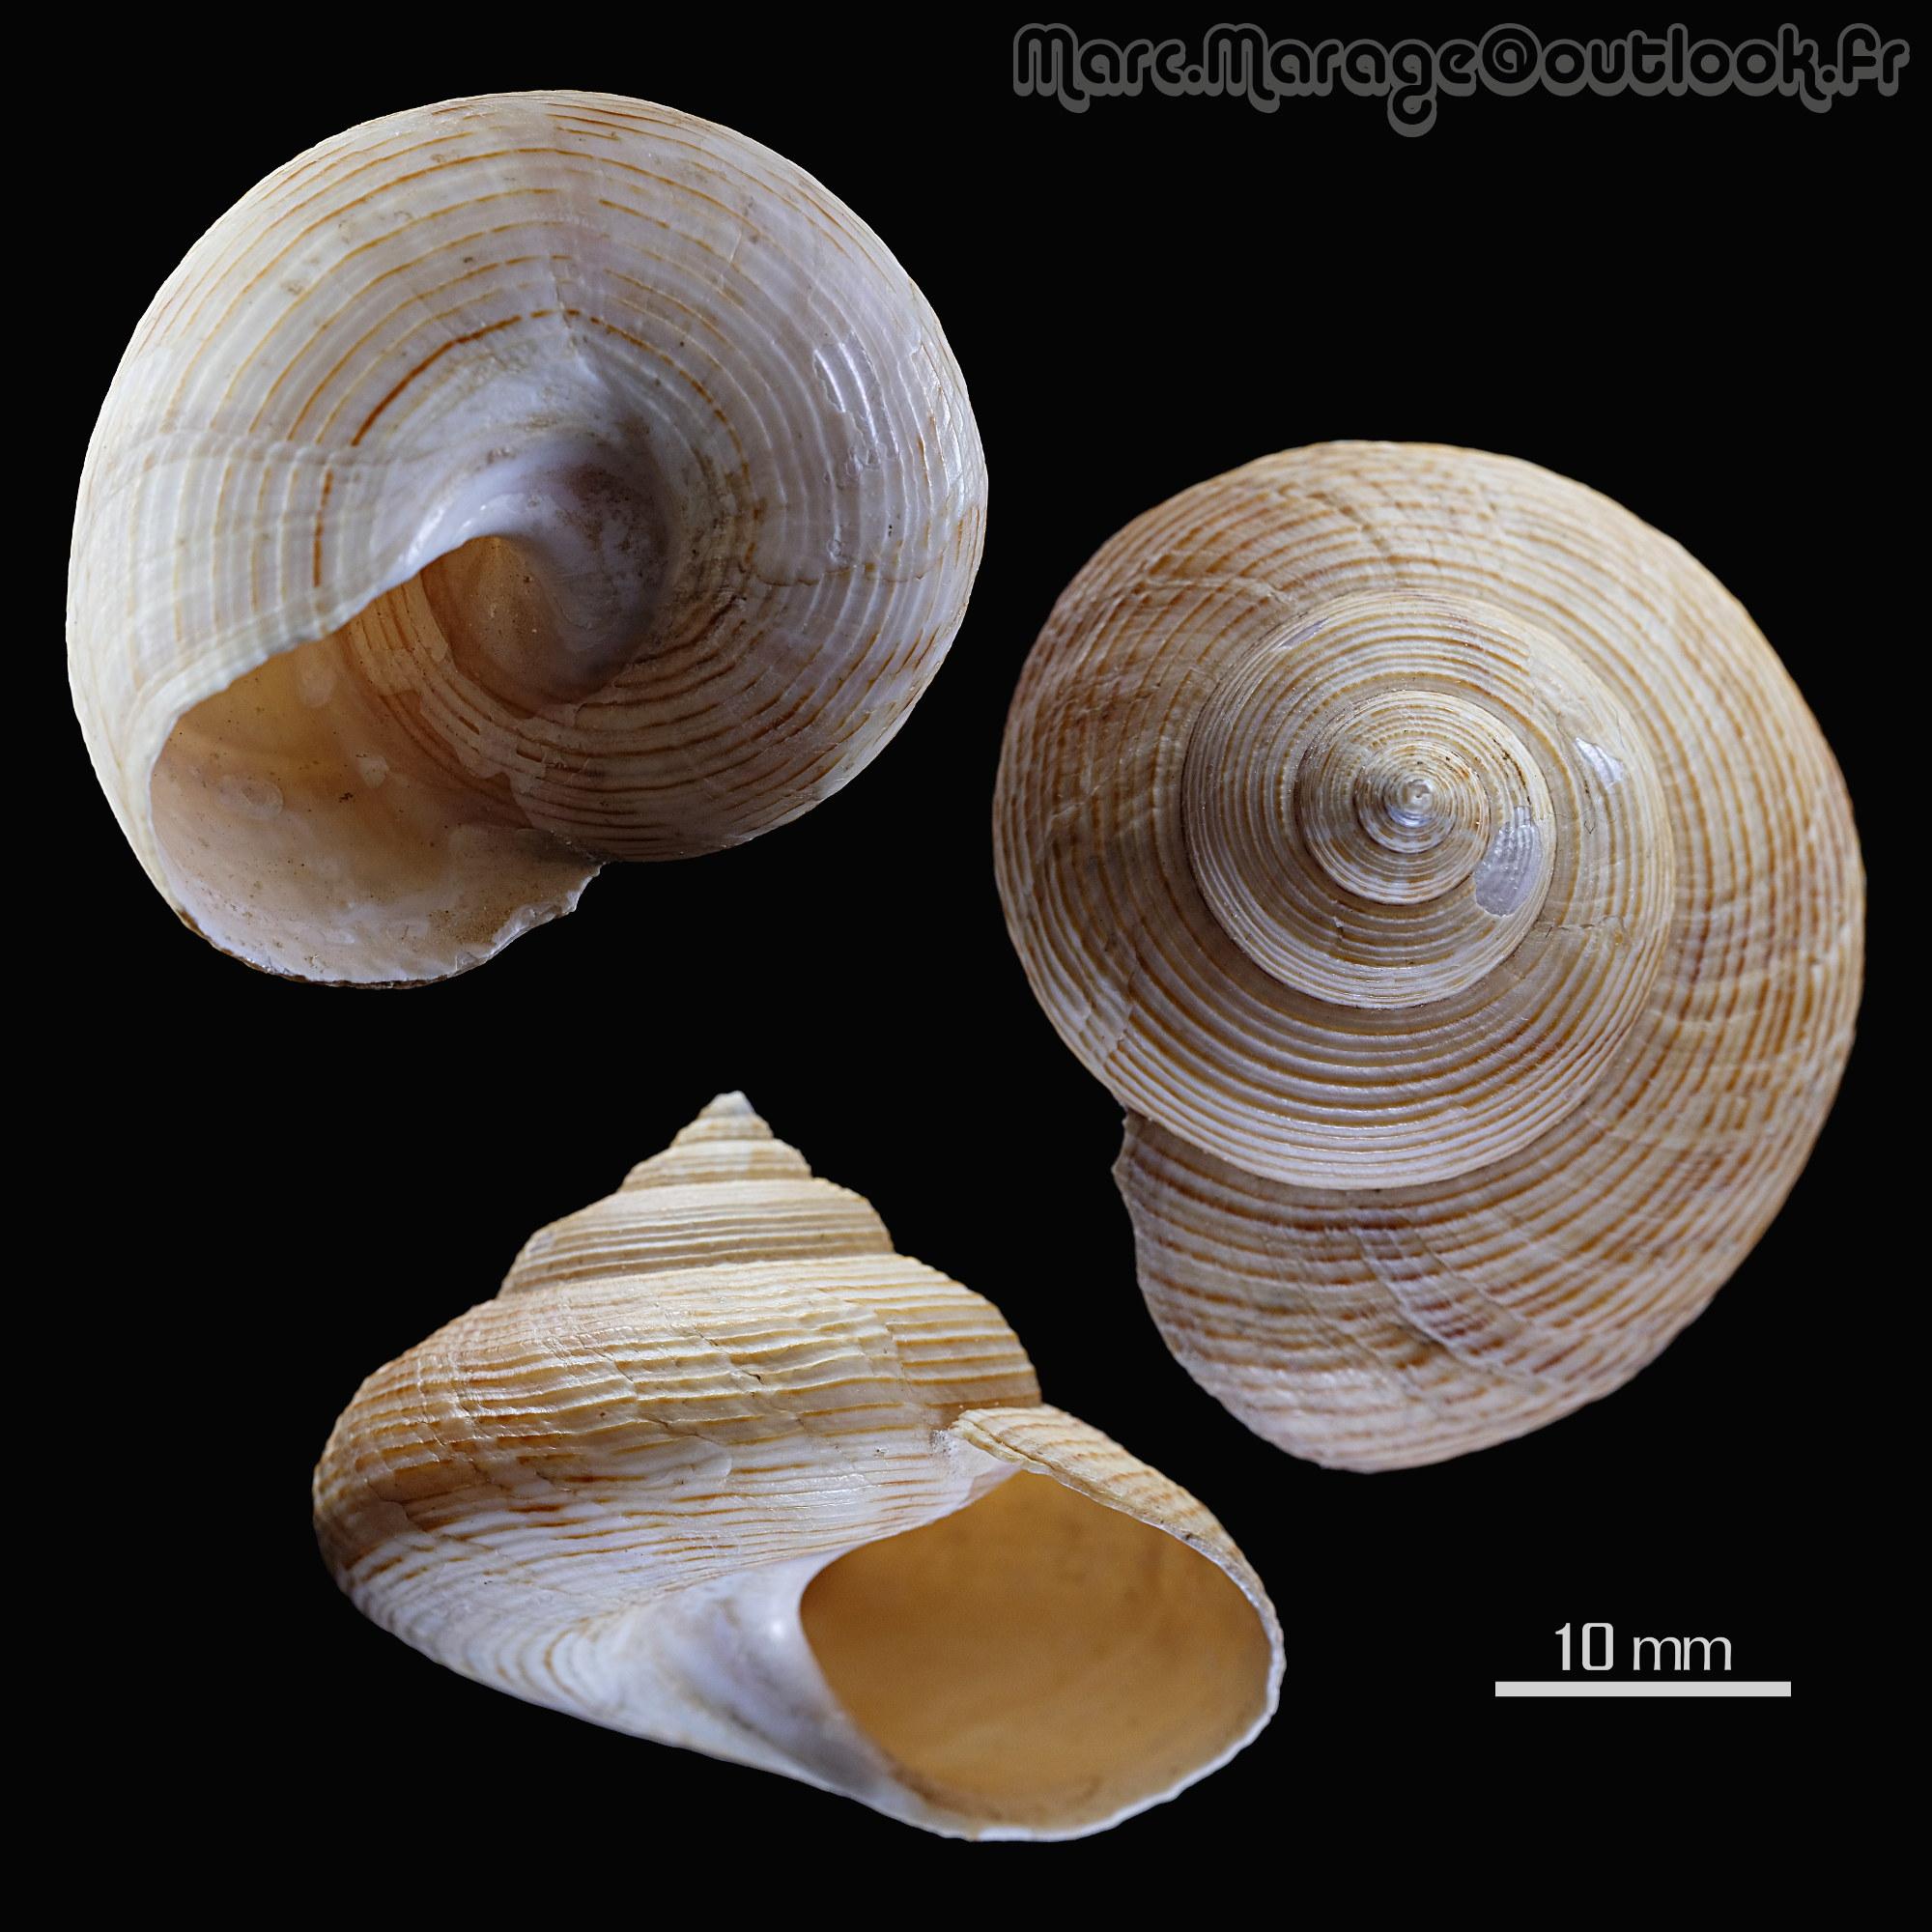 Calliostoma sp. Callio10